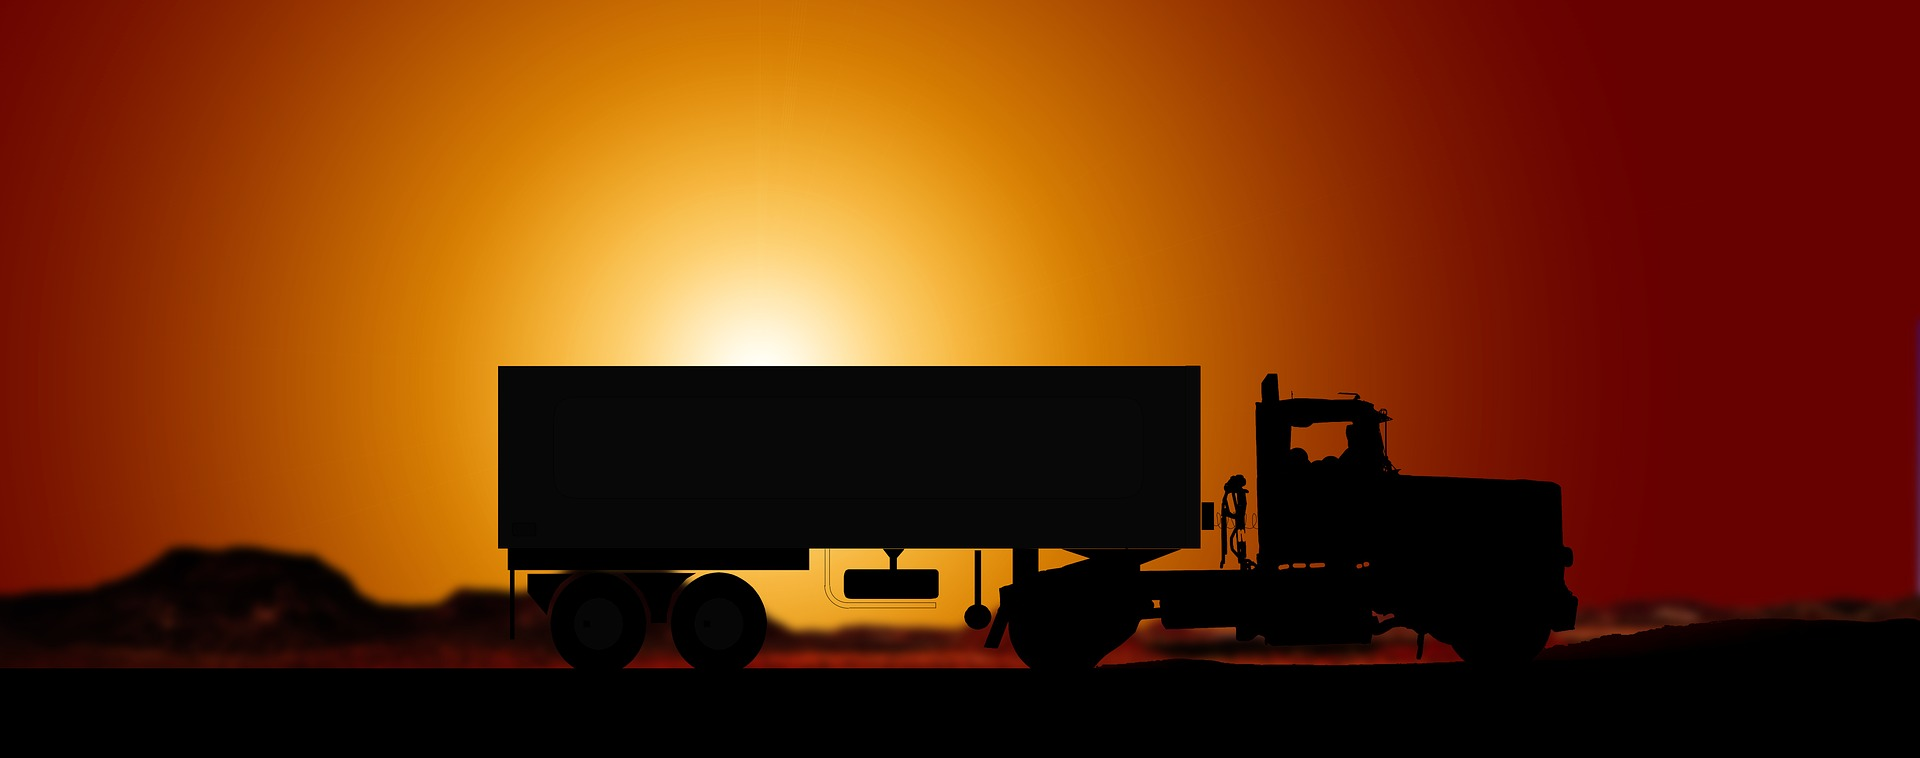 Insurance Rising For Truckers As U.S. Senate Committee Makes Overhaul